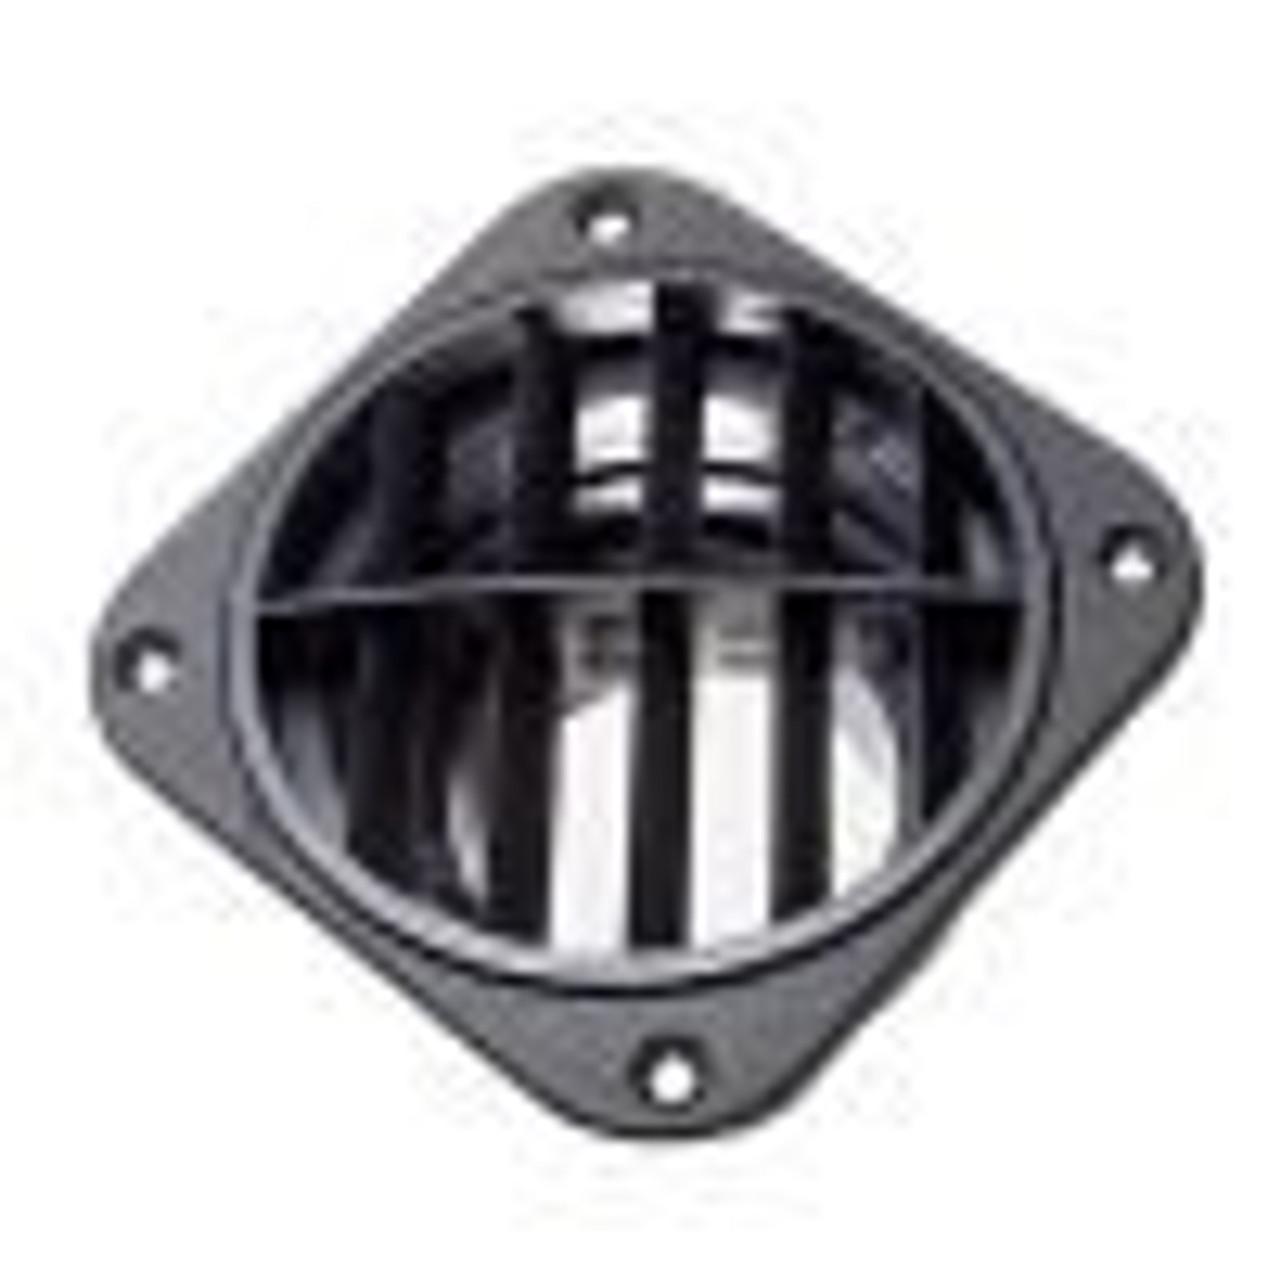 Propex HS2000 Campevan LPG Blown Air Heater 2000V1-D End Outlet